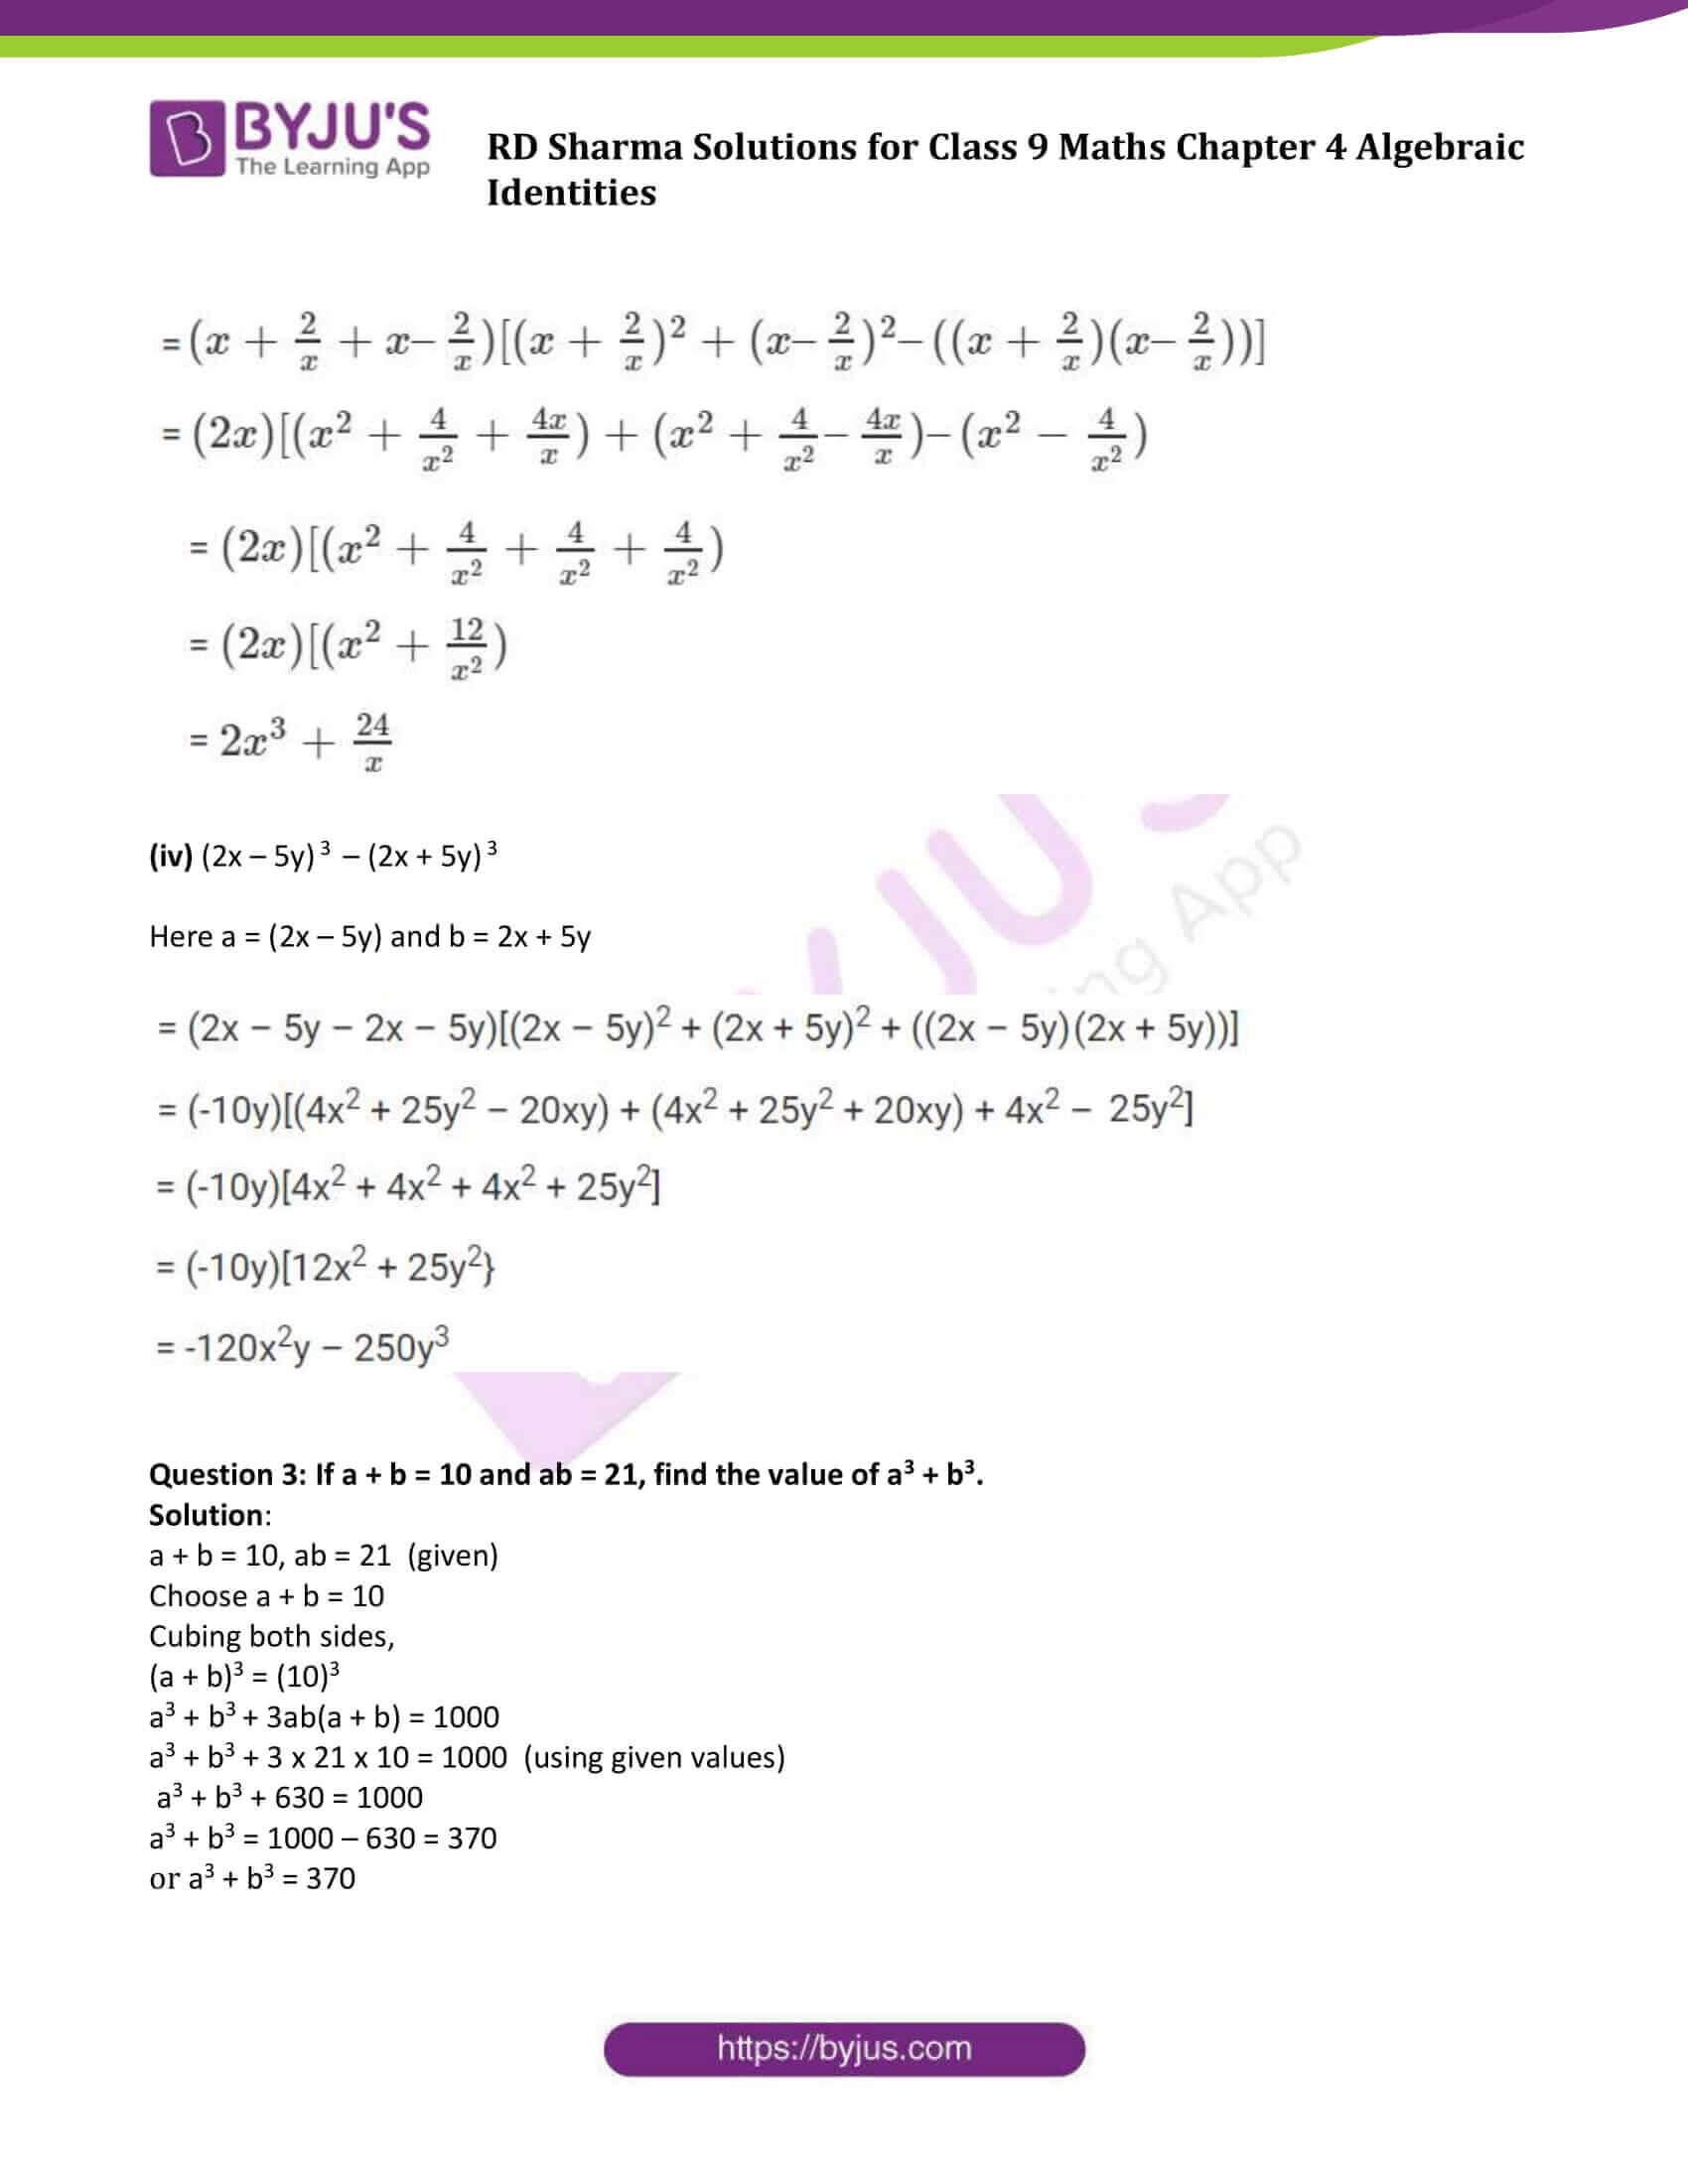 RD Sharma Solution class 9 Maths Chapter 4 Algebraic Identities 13